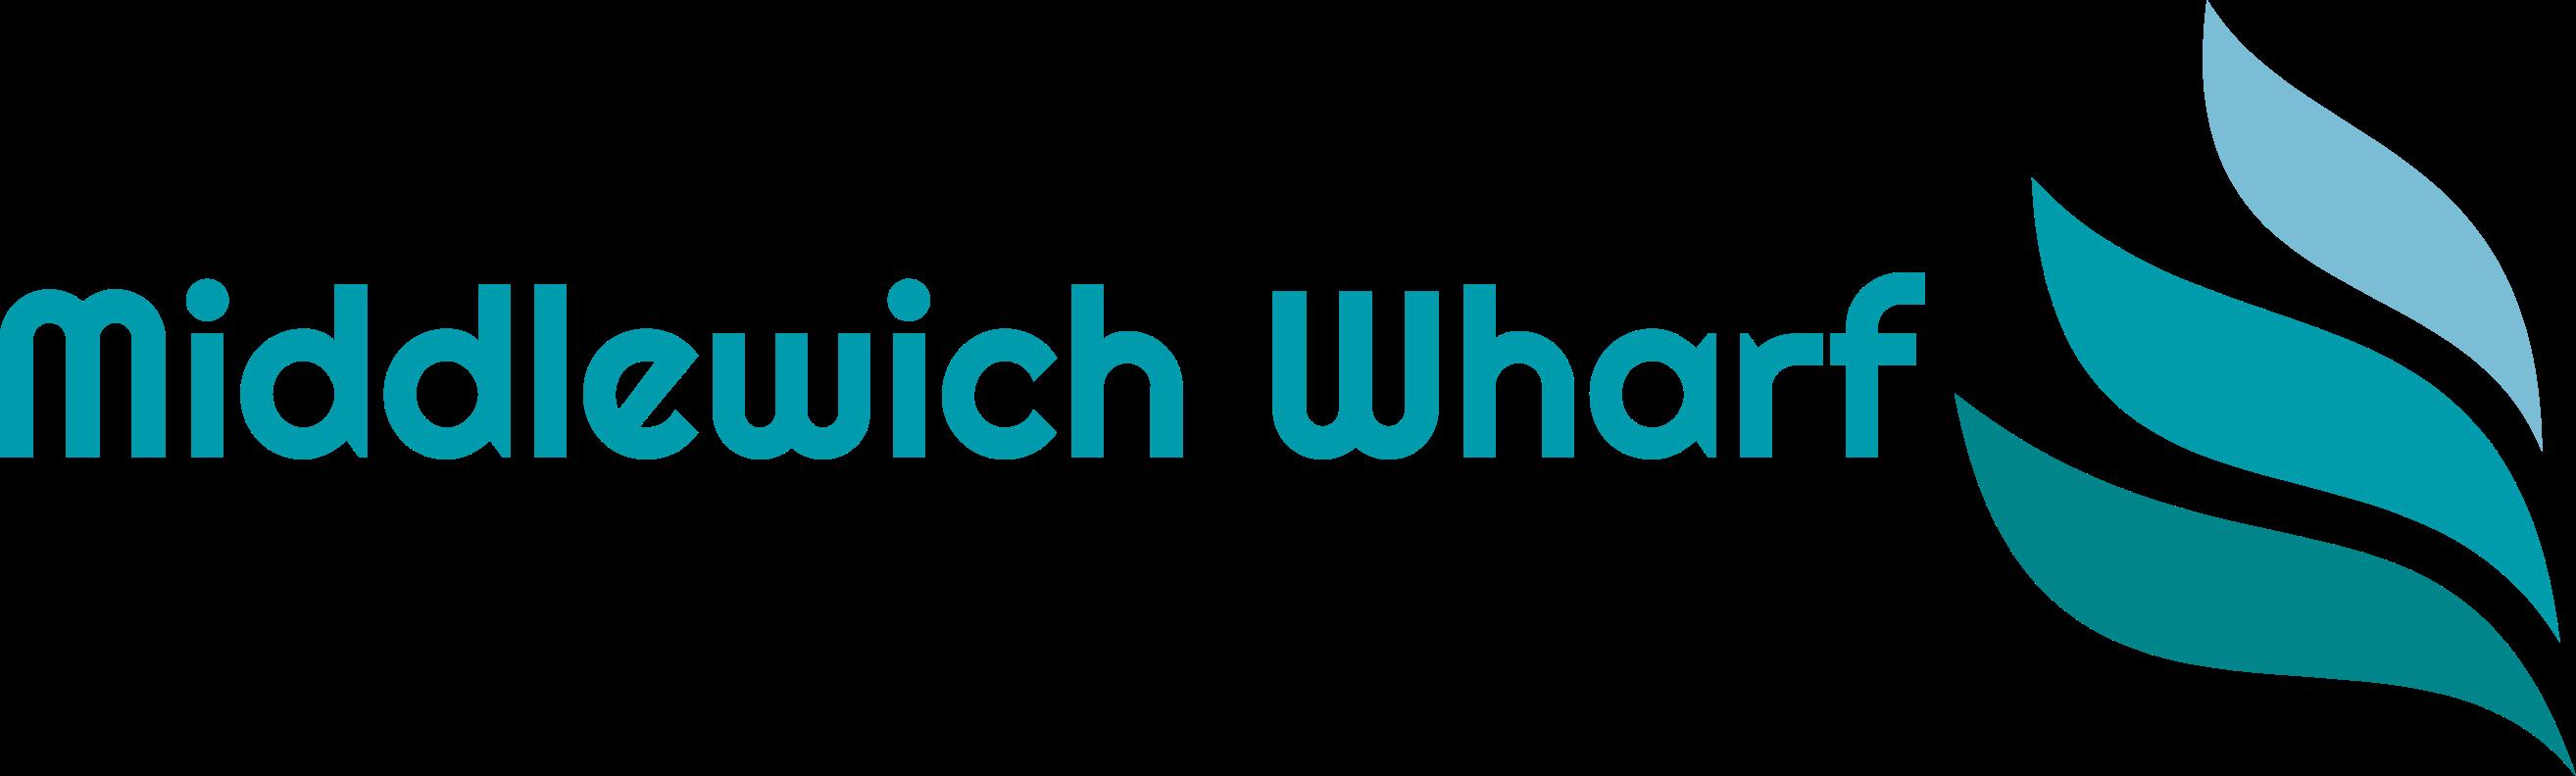 Middlewich Wharf